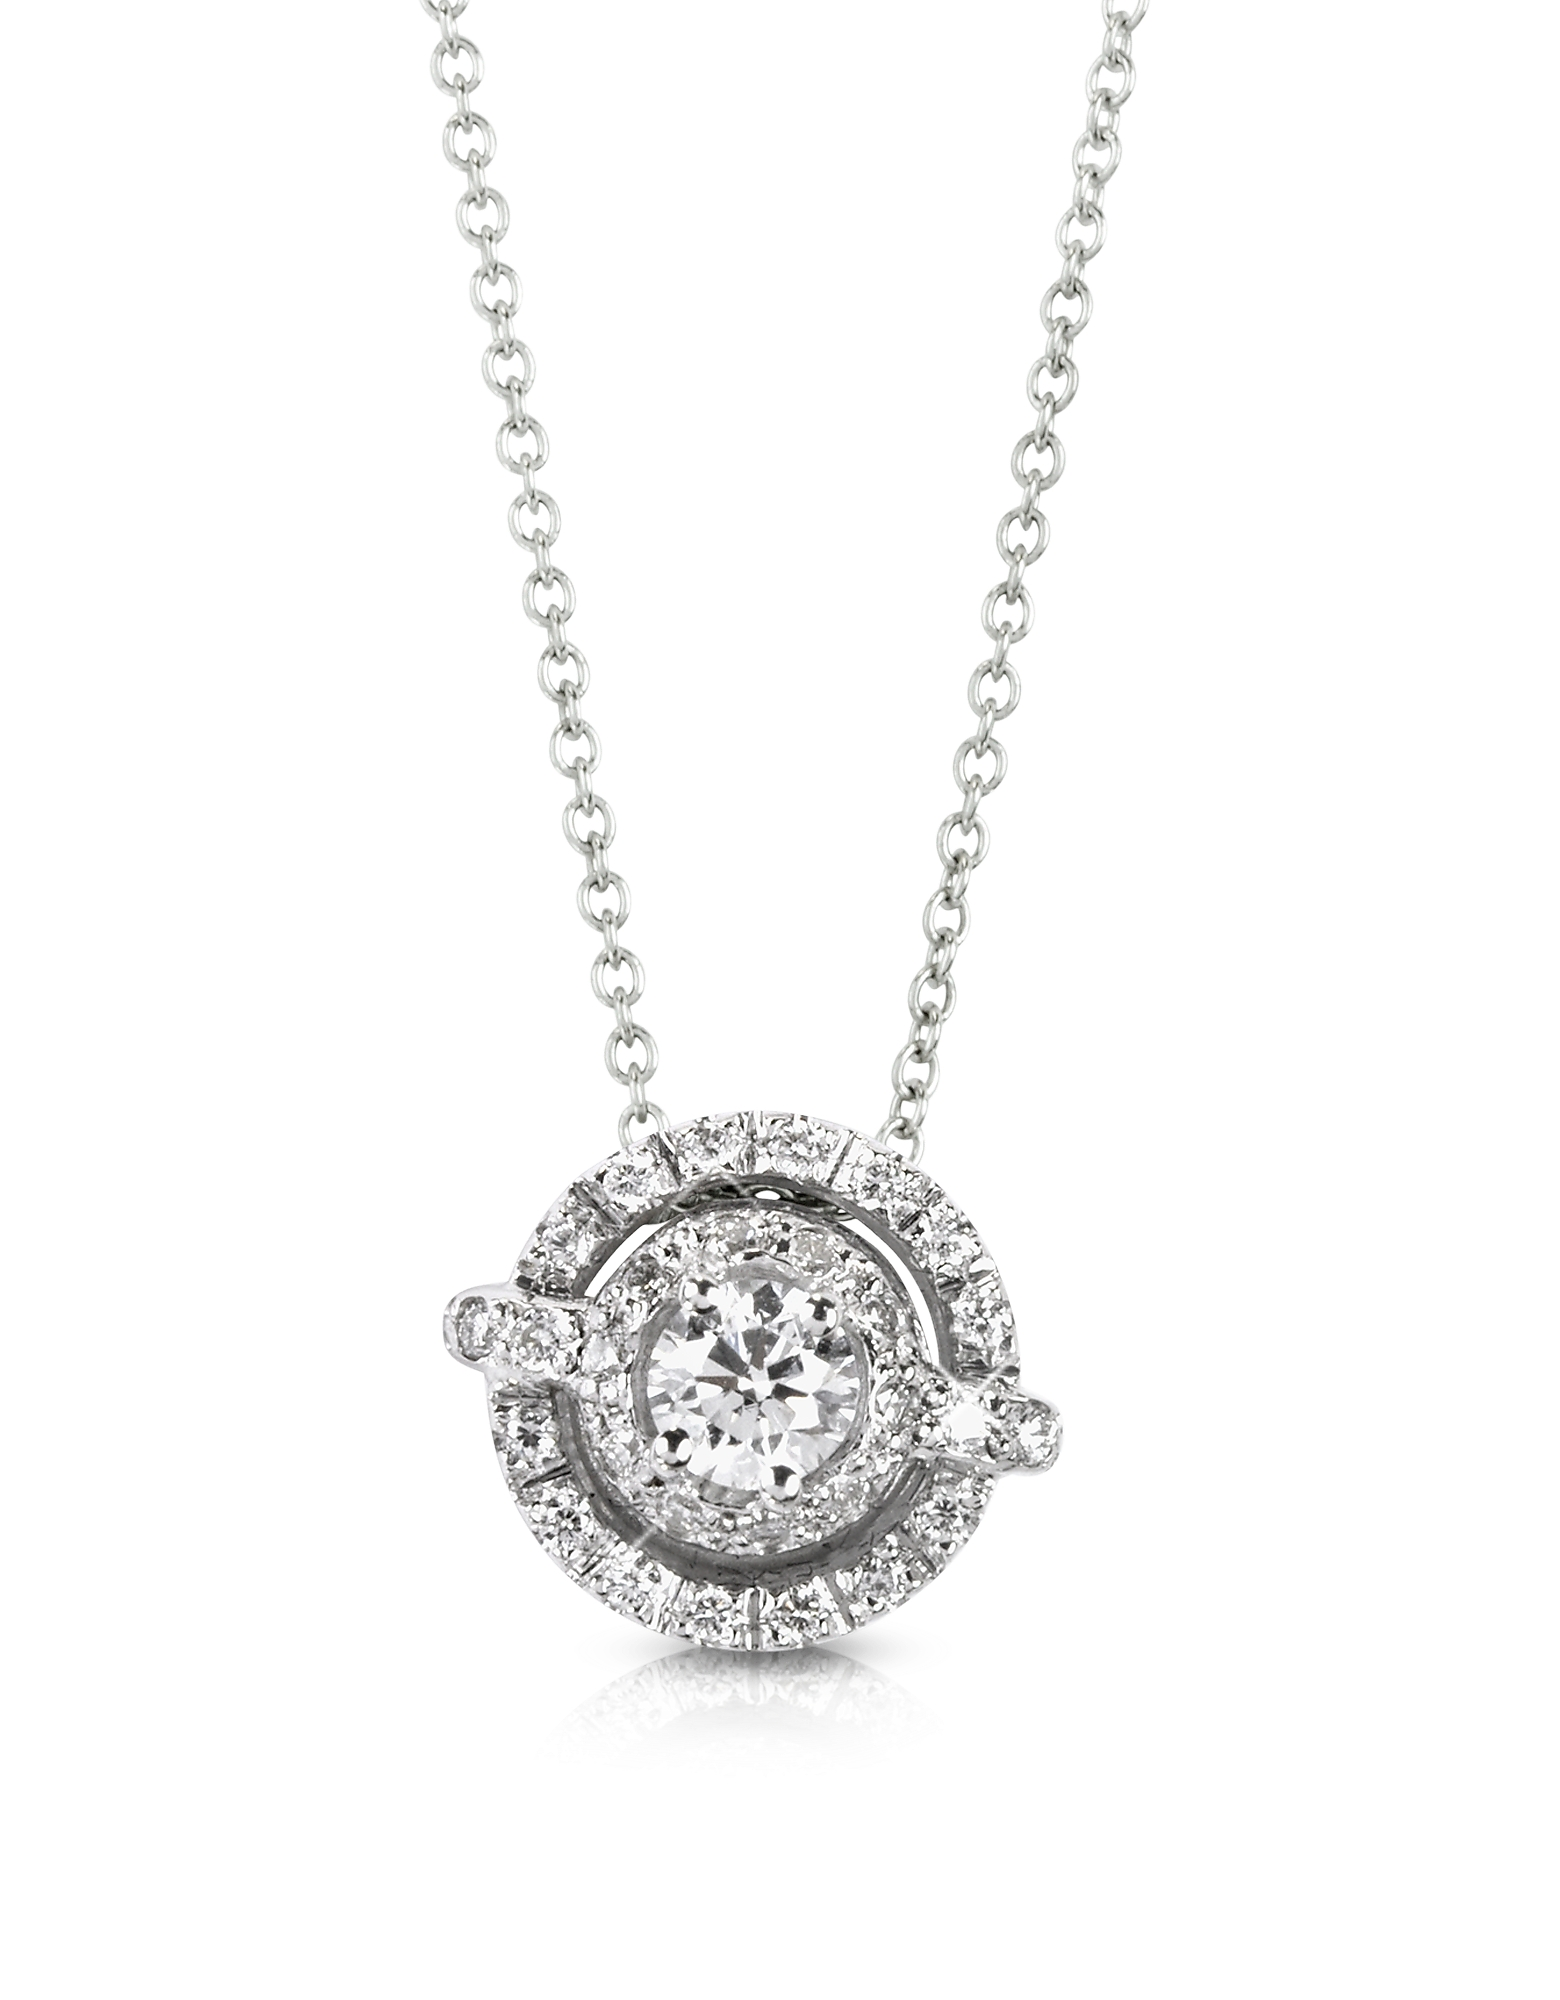 0.42 ctw Diamond 18K White Gold Pendant Necklace